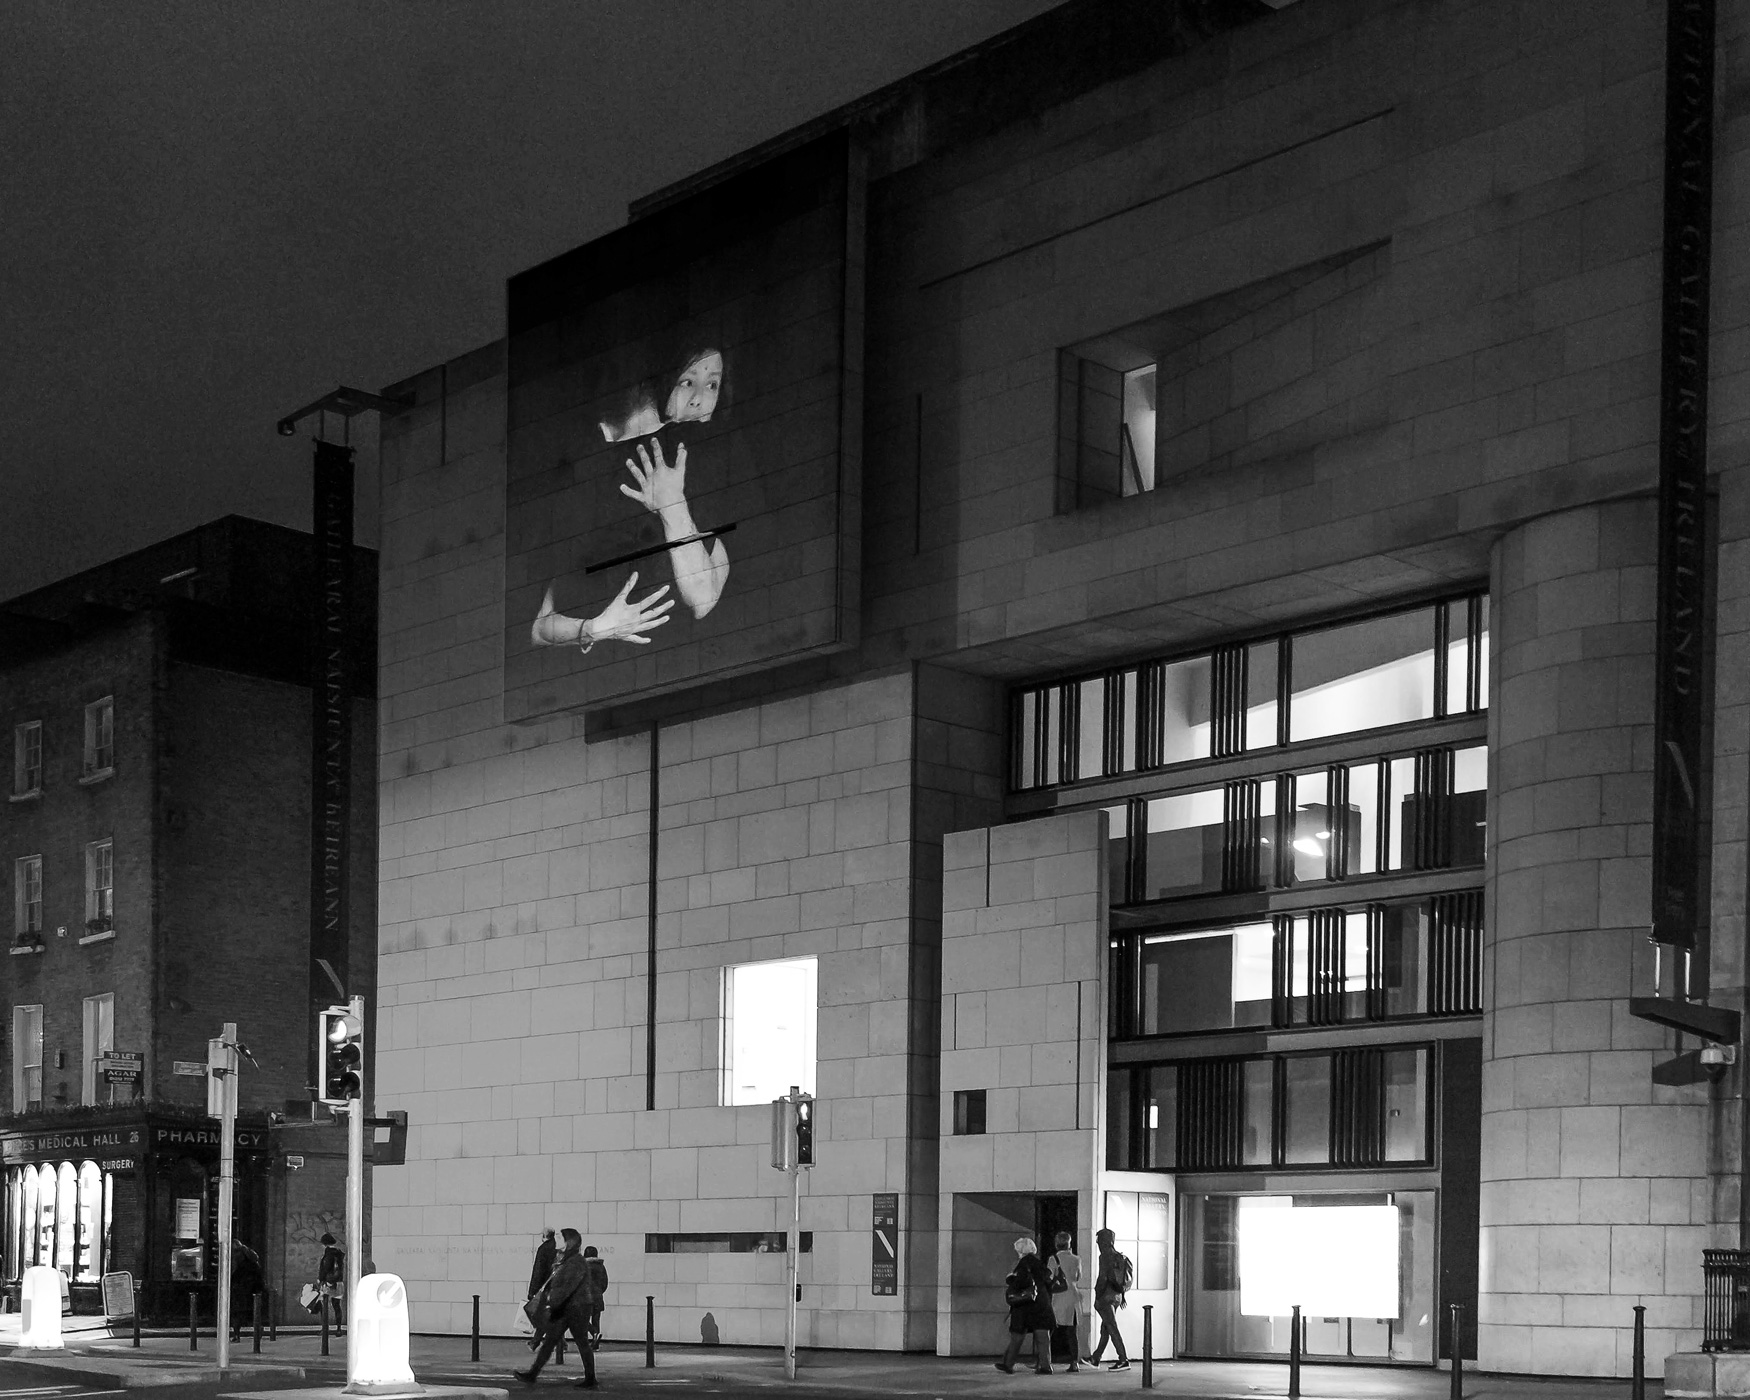 Brace Yourself (duet composition #2), Dublin 2019  commissioned by  Stockholm konst  at Kulturhuset Stadsteatern, Stockholm + National Gallery of Ireland/Dublin   International Herstory Light festival